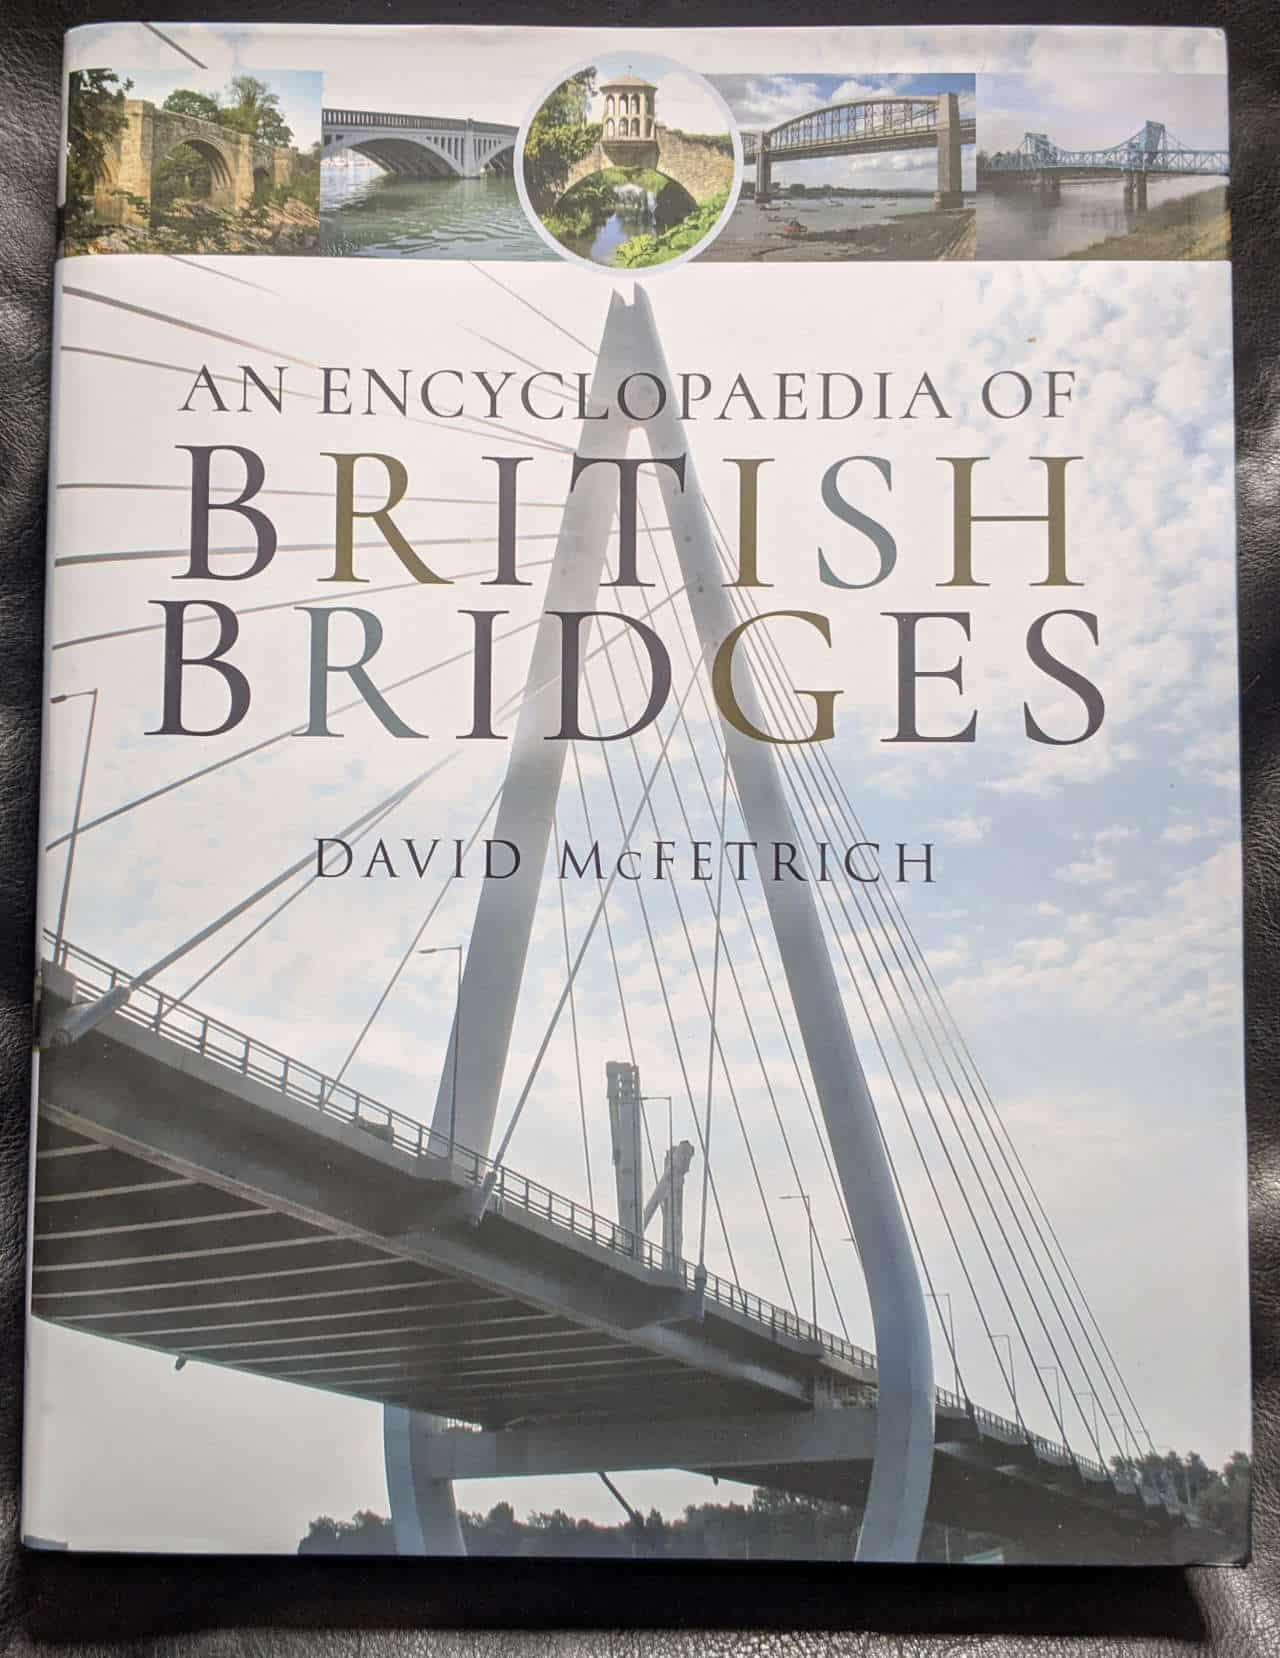 An Encylopedia of British Bridges book